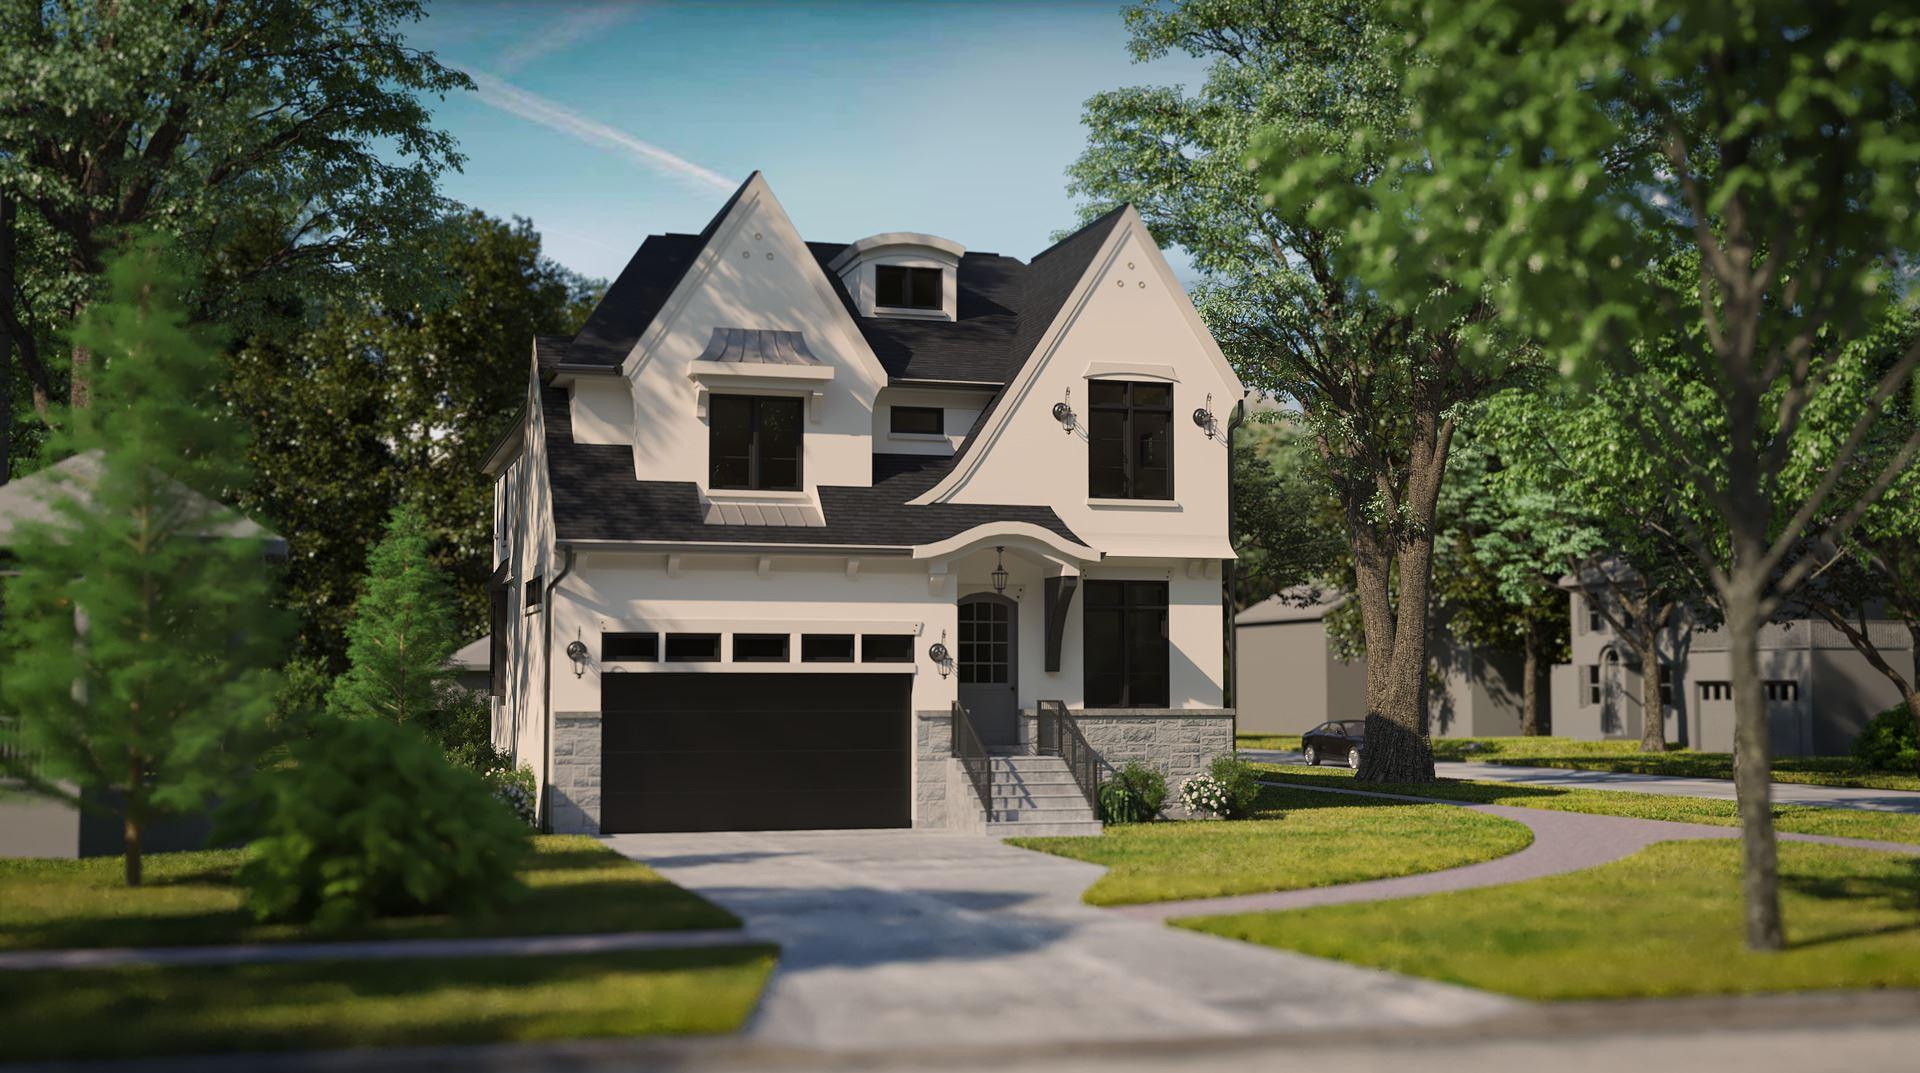 227 S Sunnyside Avenue, Elmhurst, IL 60126 - #: 10765664